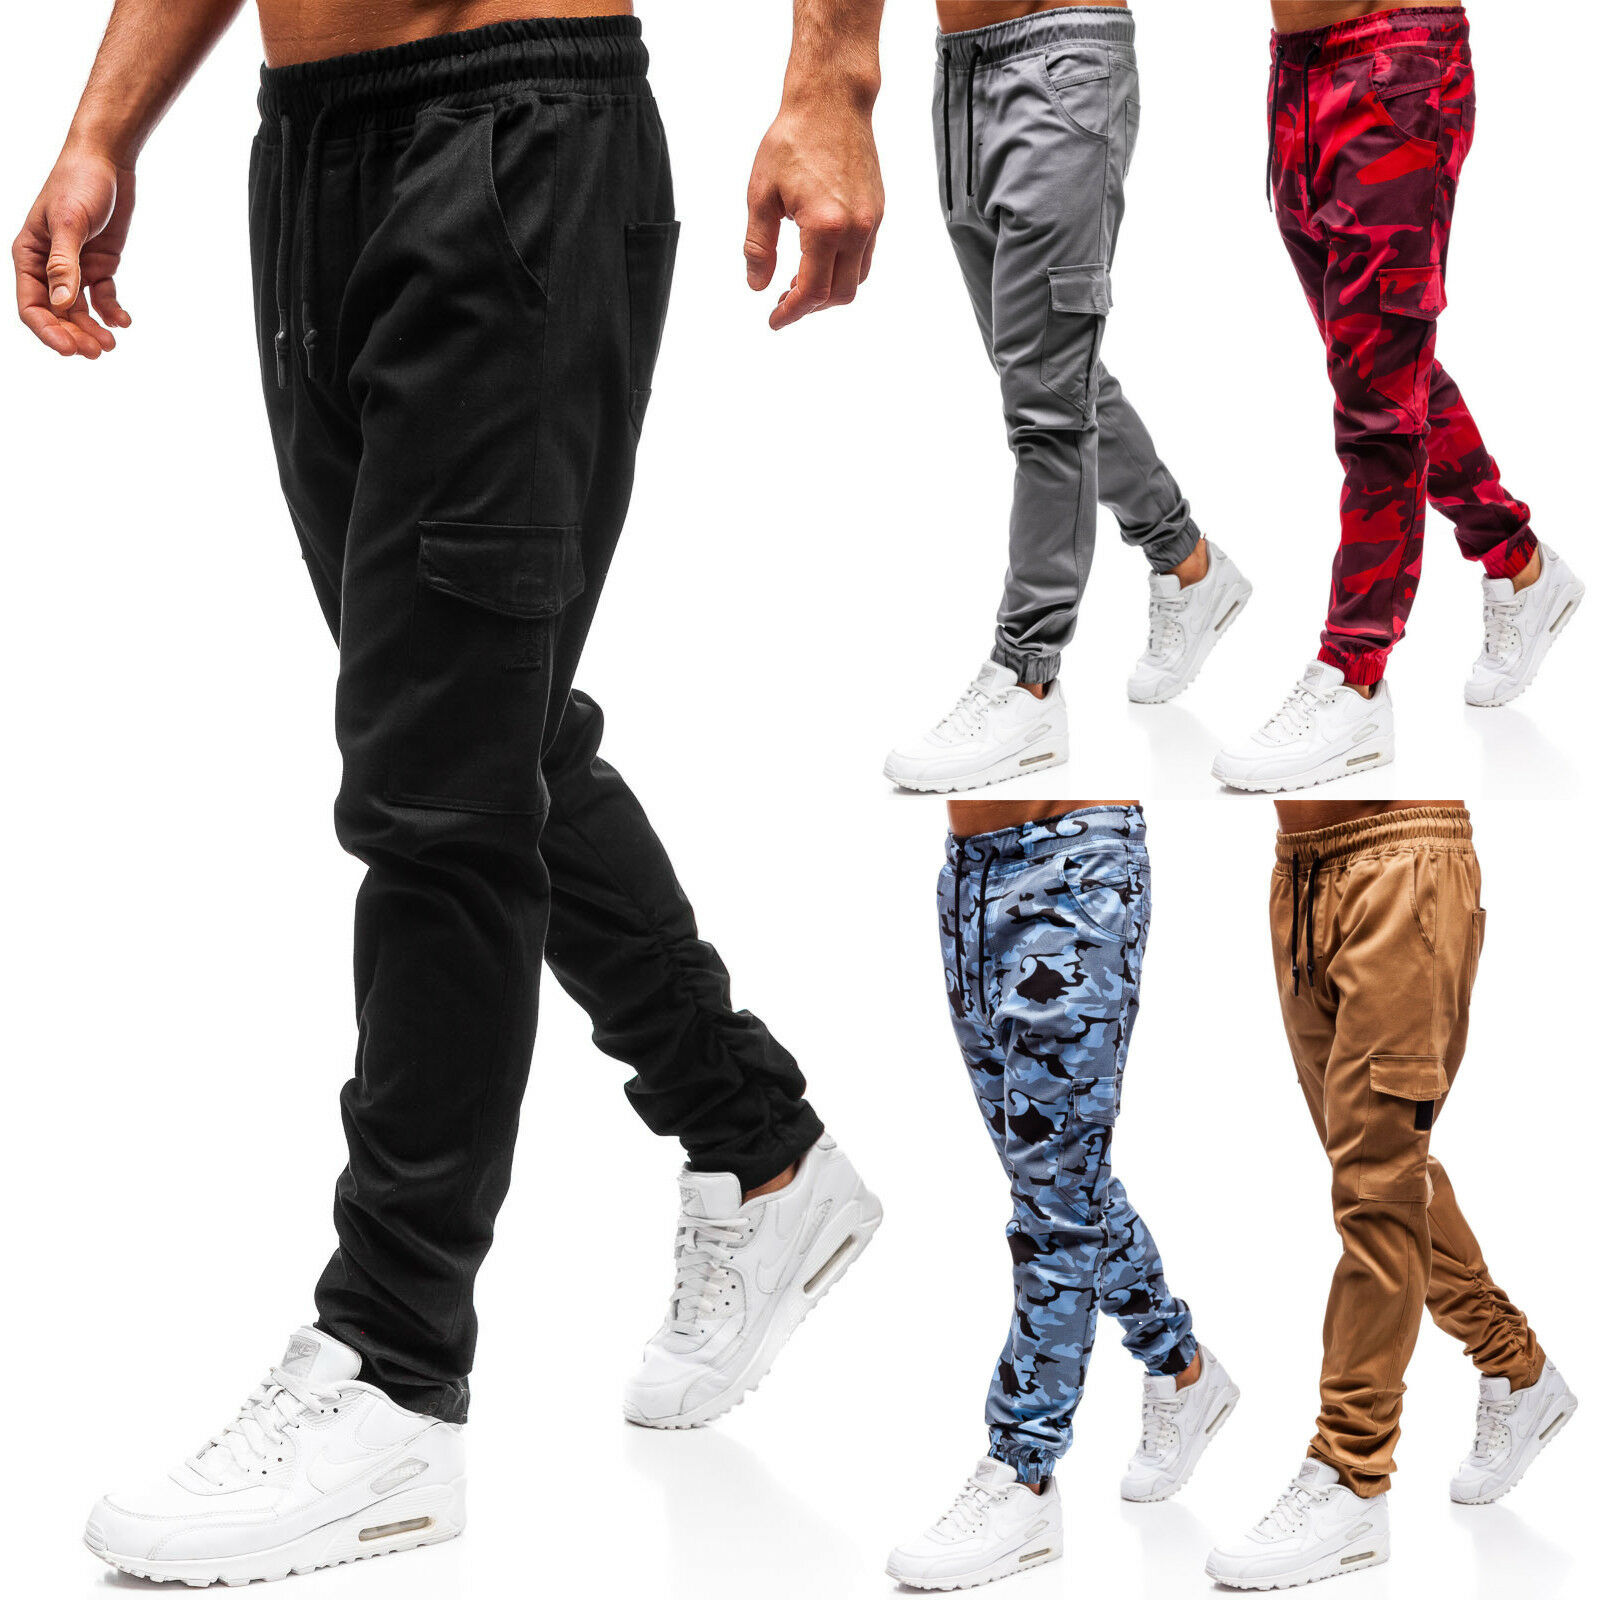 Sweatpants Pants Training Jogging Sports Joggers Trousers Mens Mix BOLF 6F6 Camo